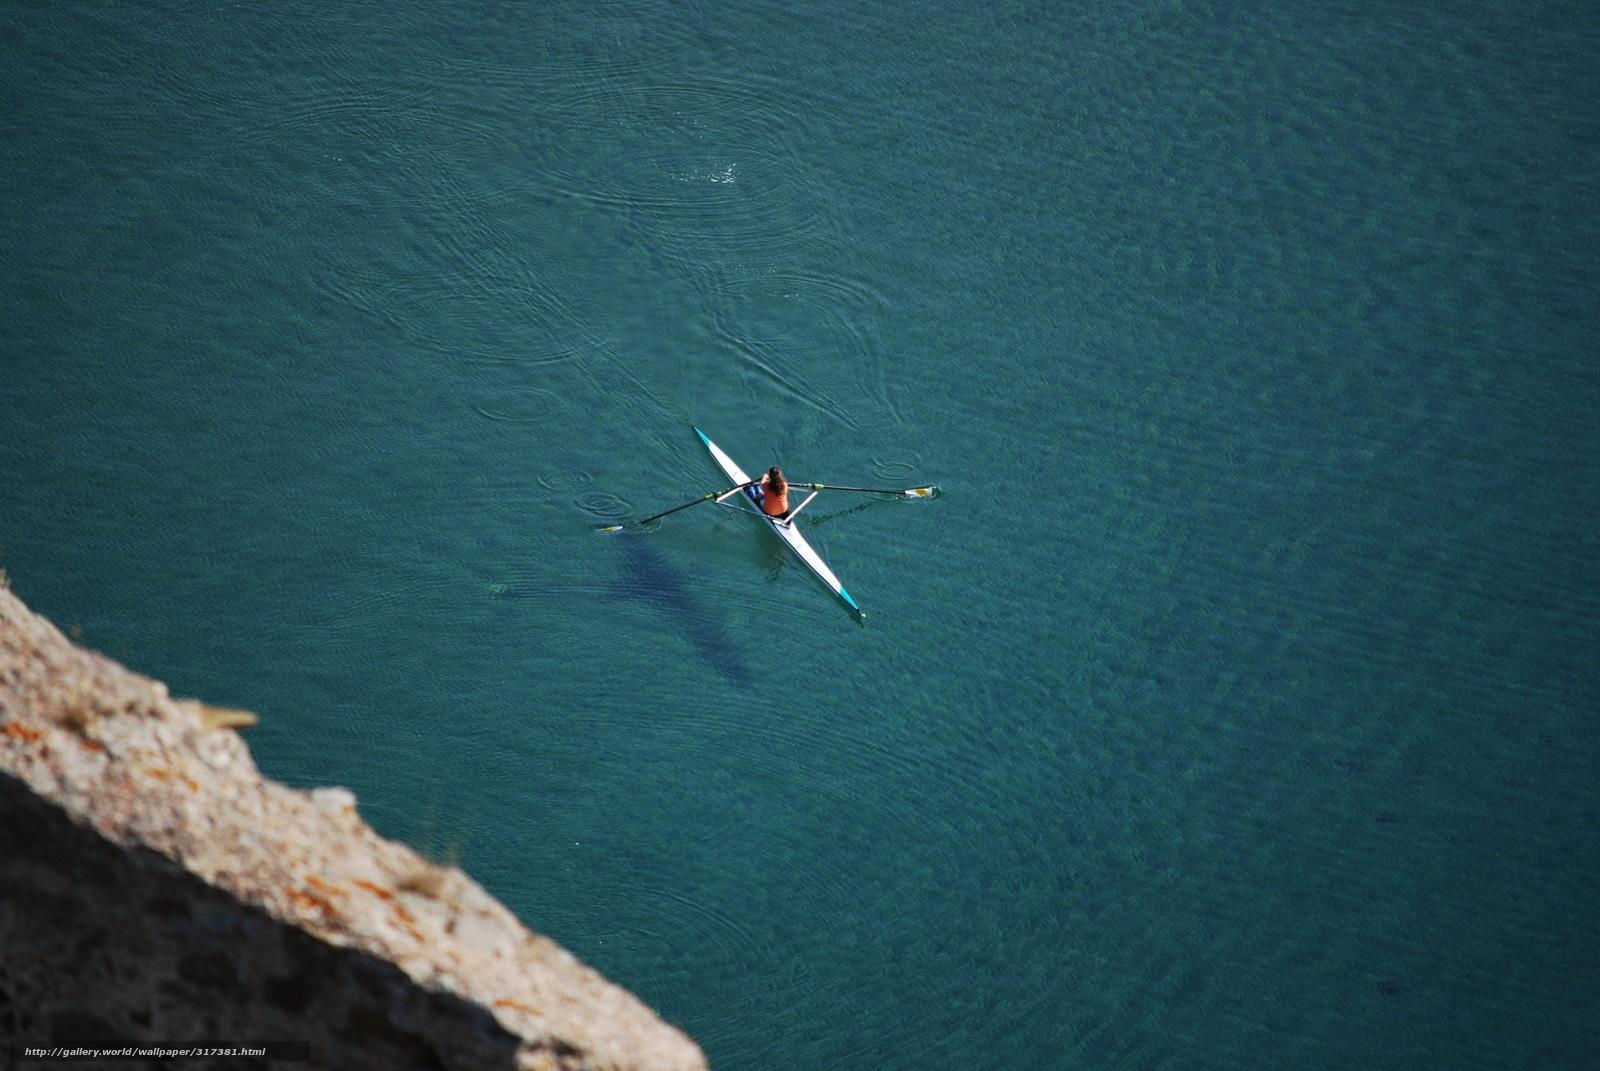 Download wallpaper sport rowing water free desktop - Wallpaper picture ...